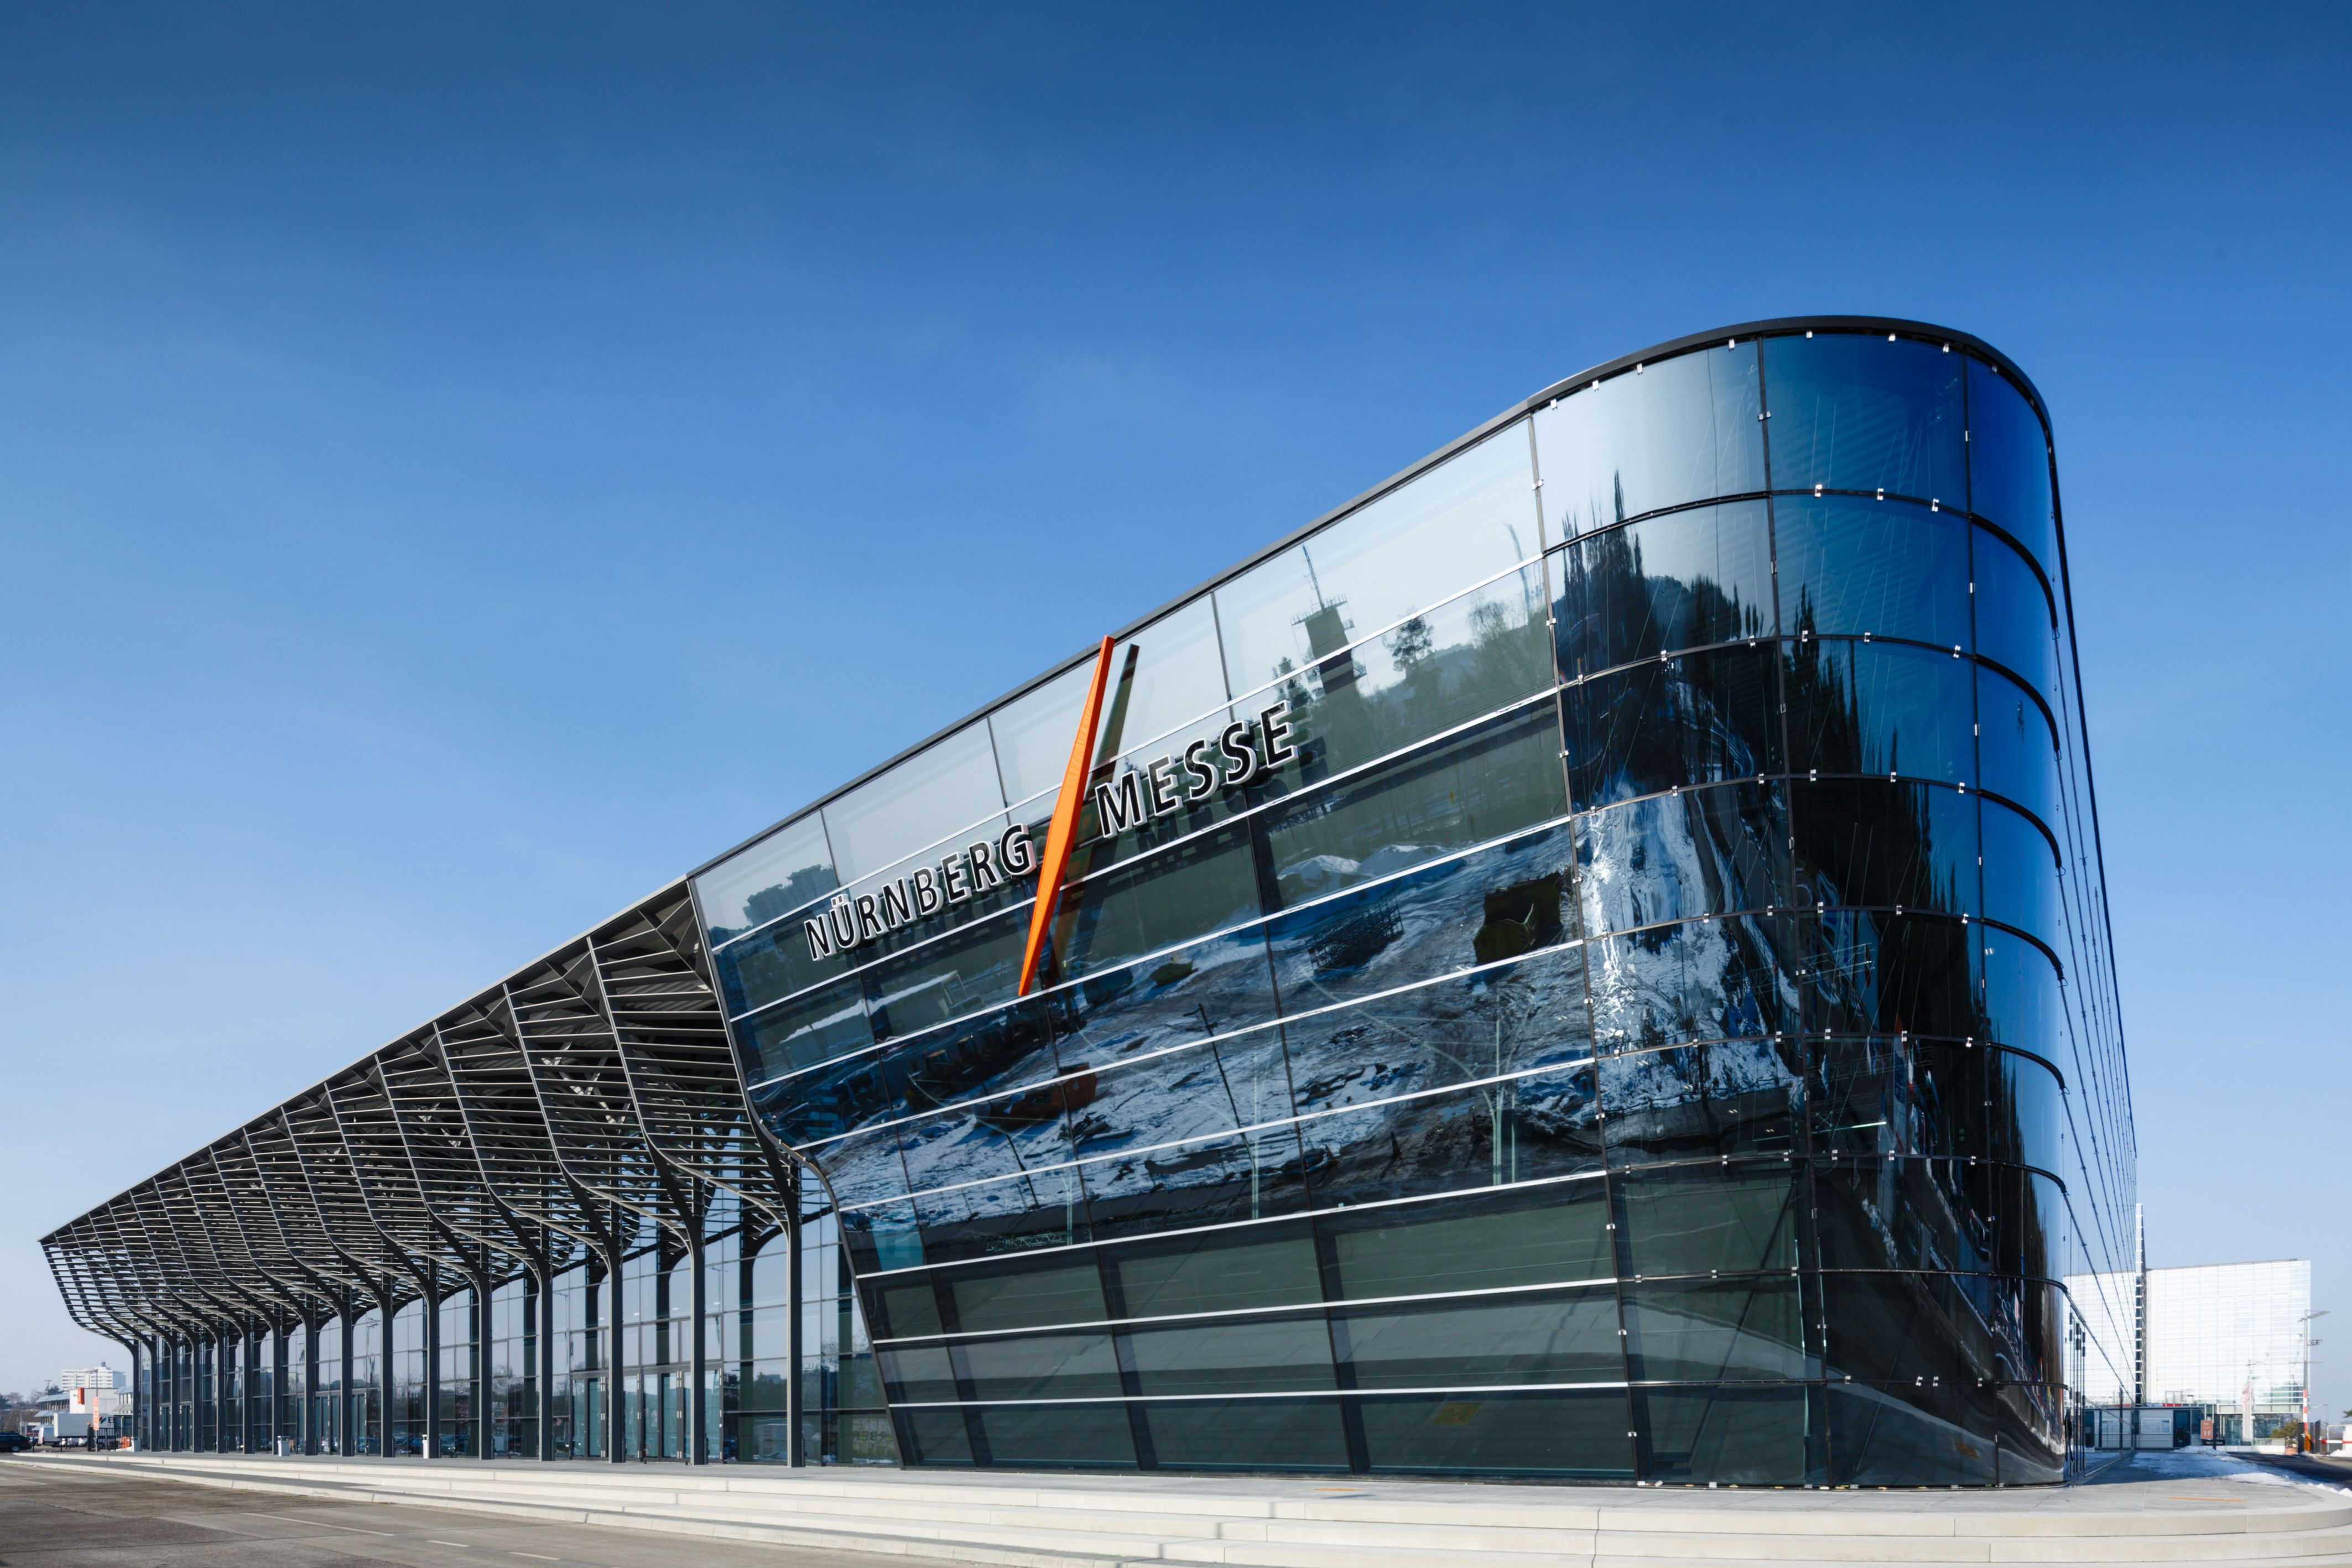 Architekten Nürnberg nürnbergmesse zahahadid architektur nürnberg copyright